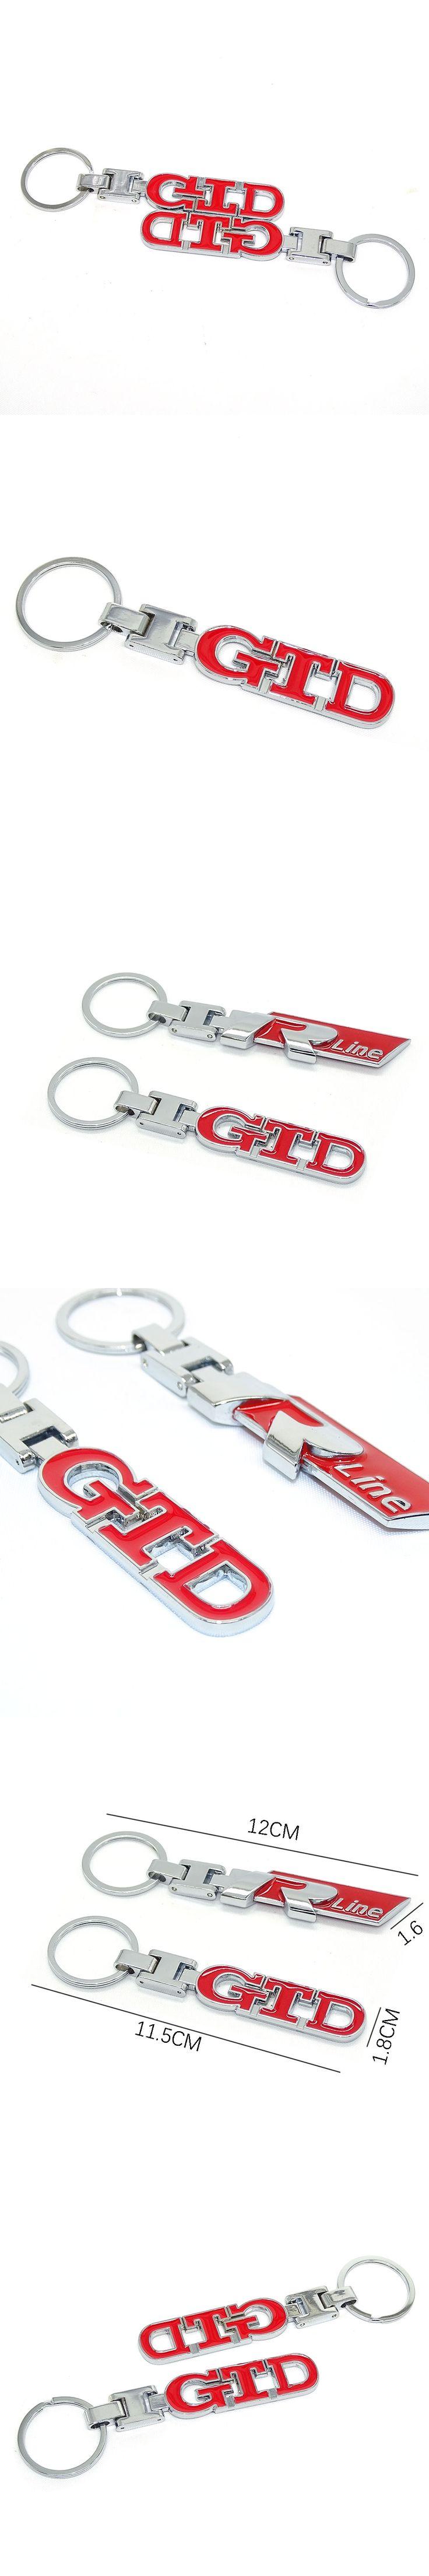 For VW Volkswagen Golf Polo Sedan Jetta Touareg 4 5 6 7 3D Metal Rline  GTD Emblem Auto Keychain Key Chain  Car Accessories